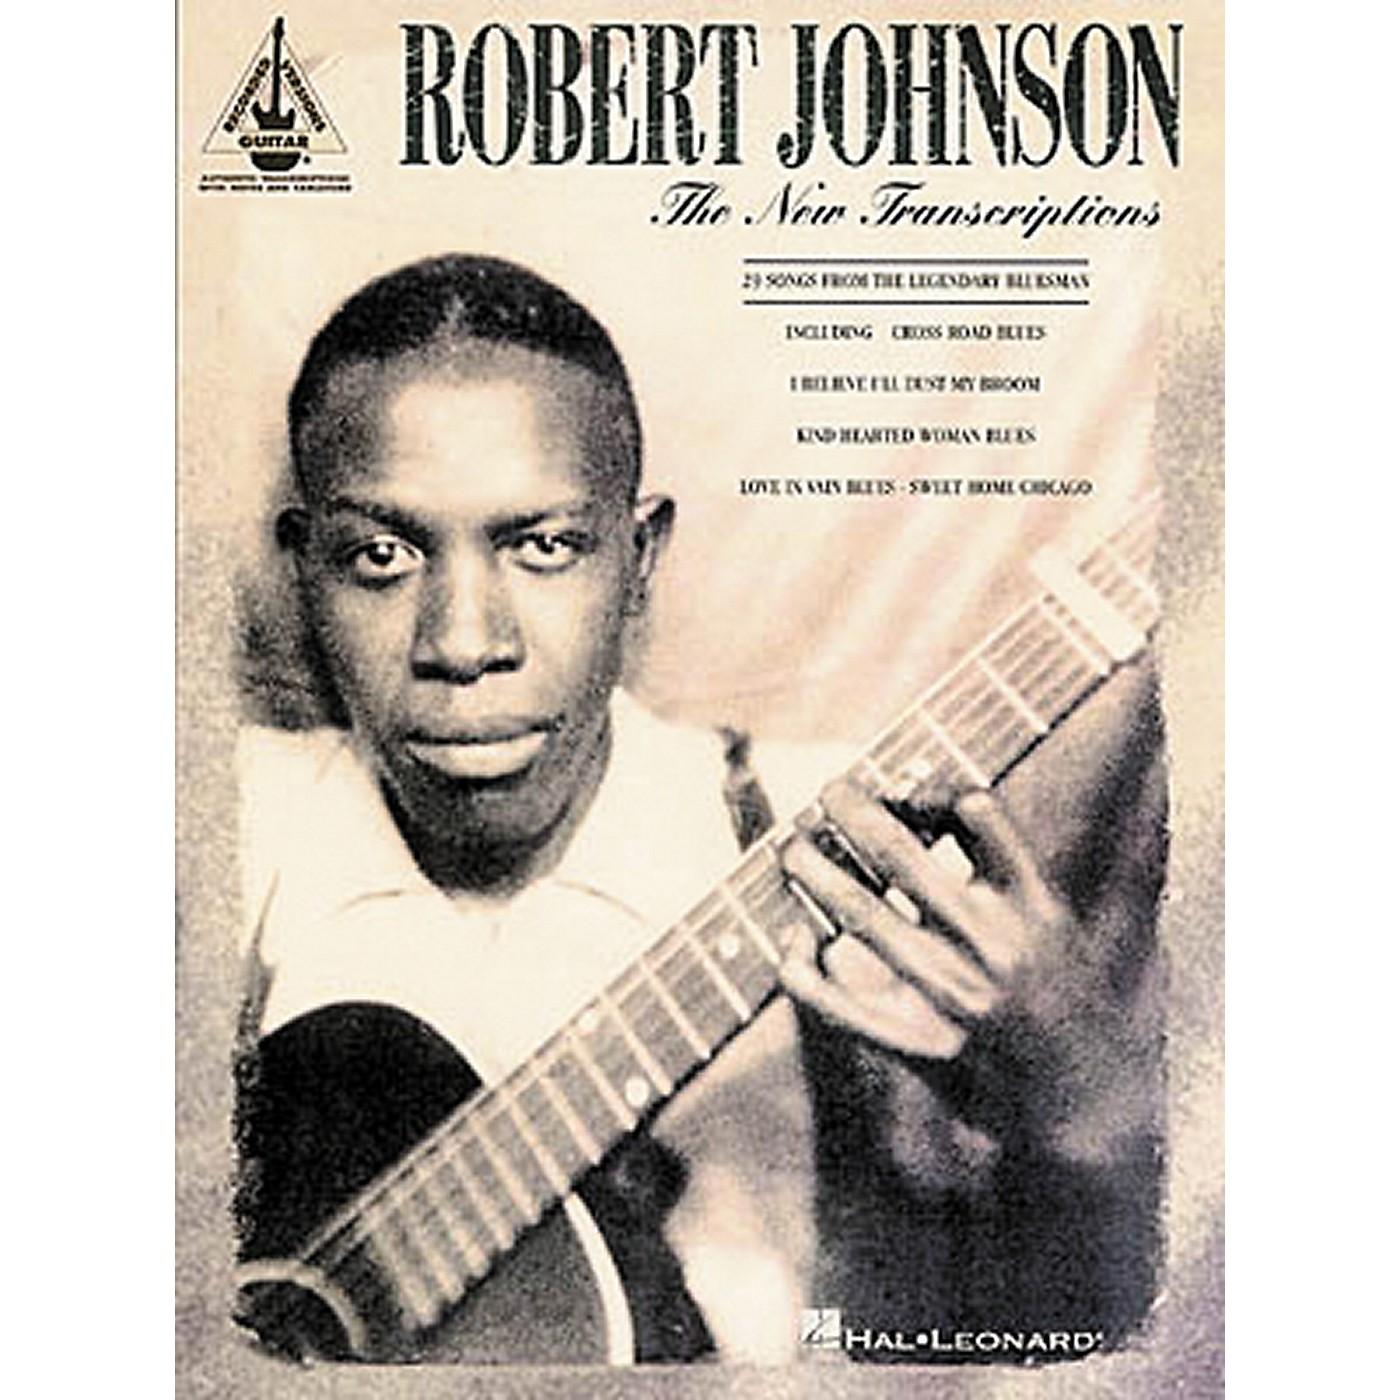 Hal Leonard Robert Johnson - The New Transcriptions Guitar Tab Songbook thumbnail